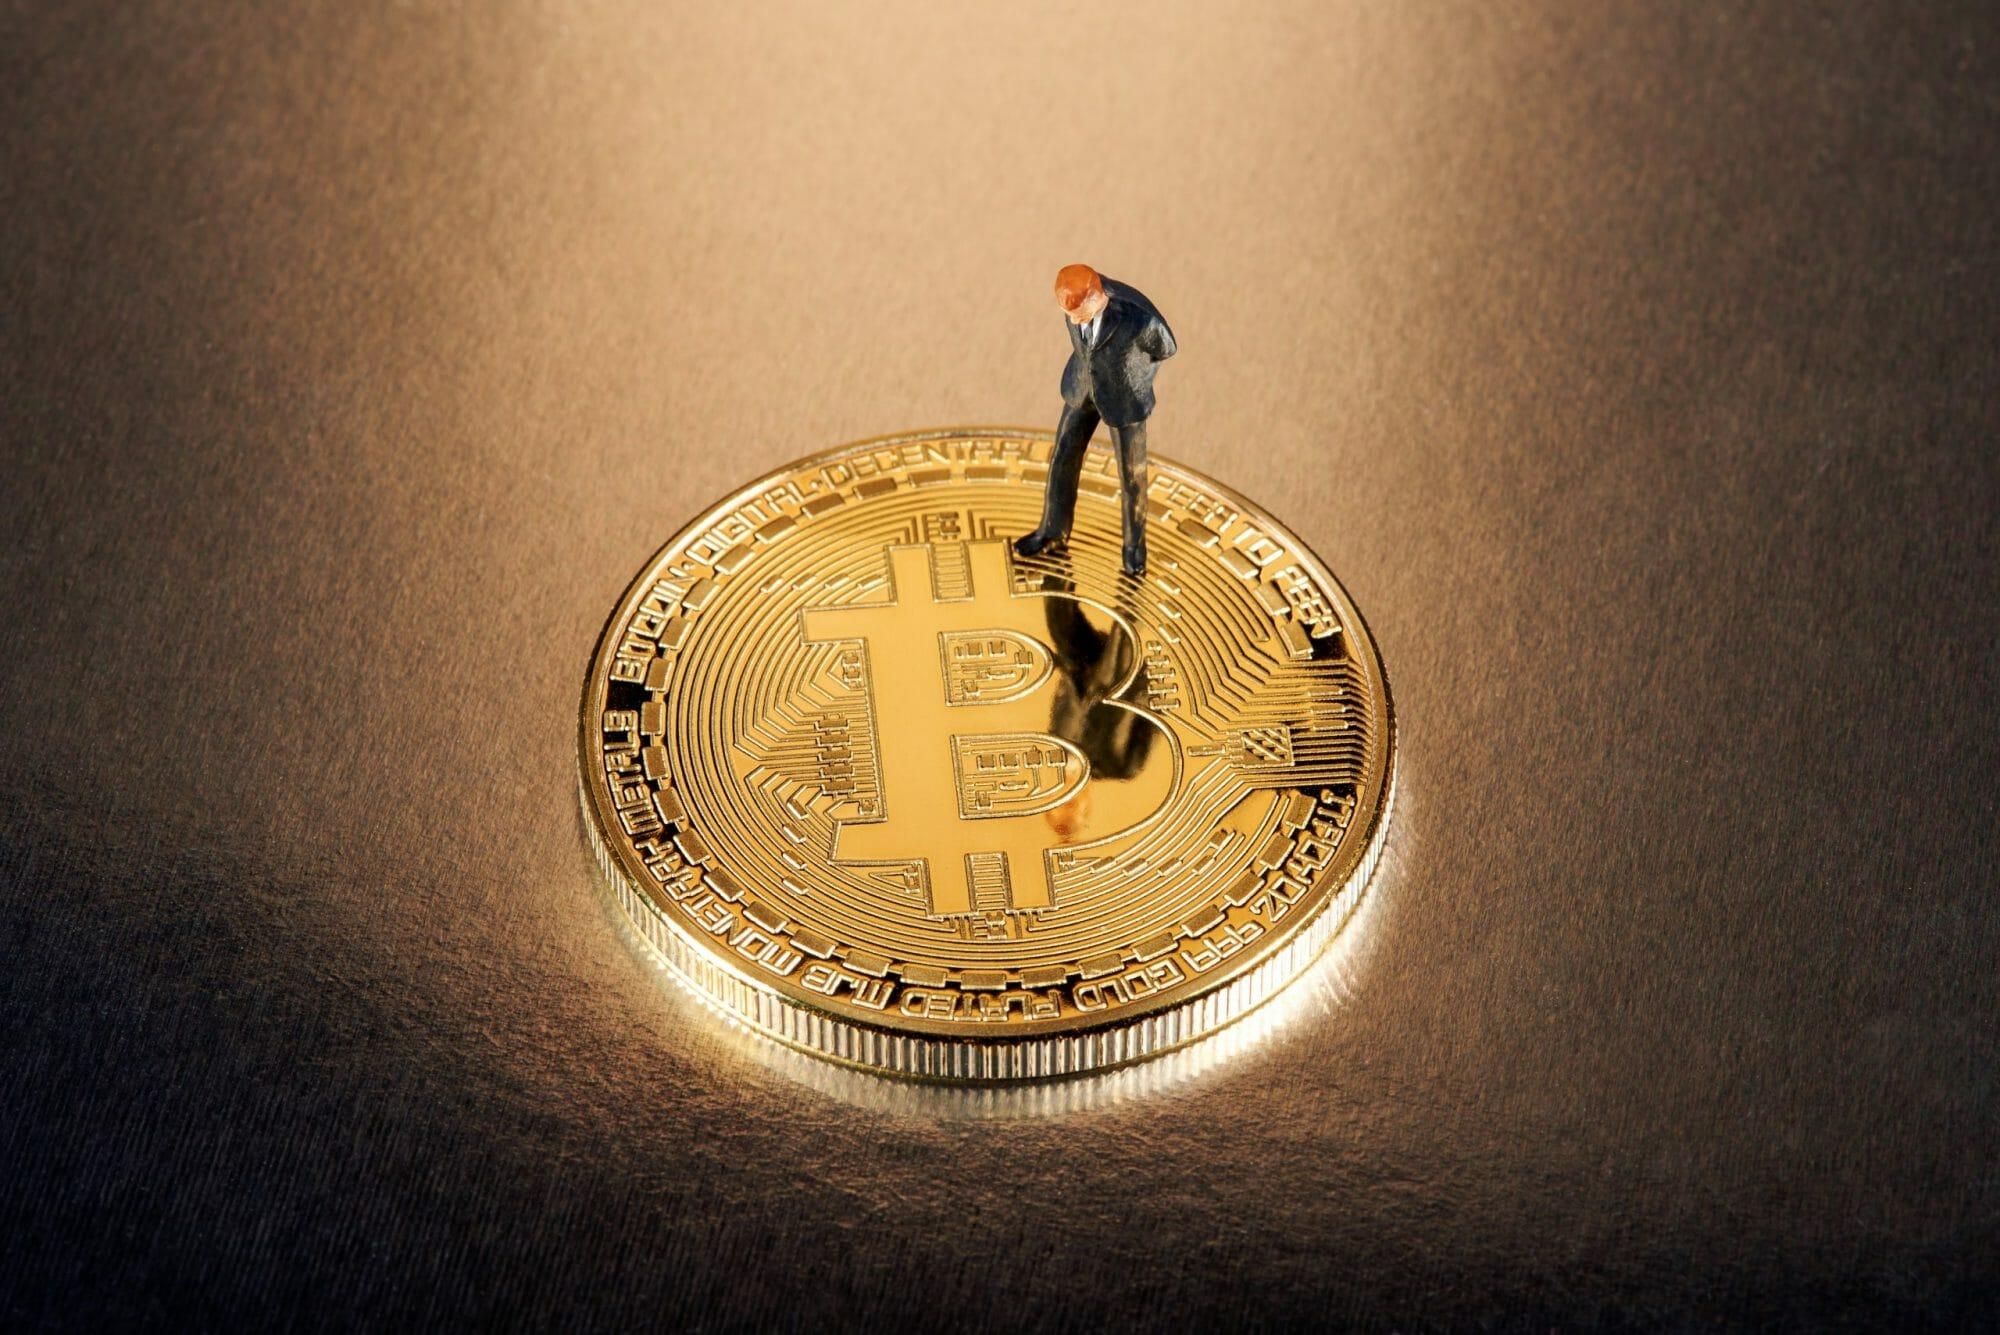 Miniature-figure-on-bitcoin-724712-scaled